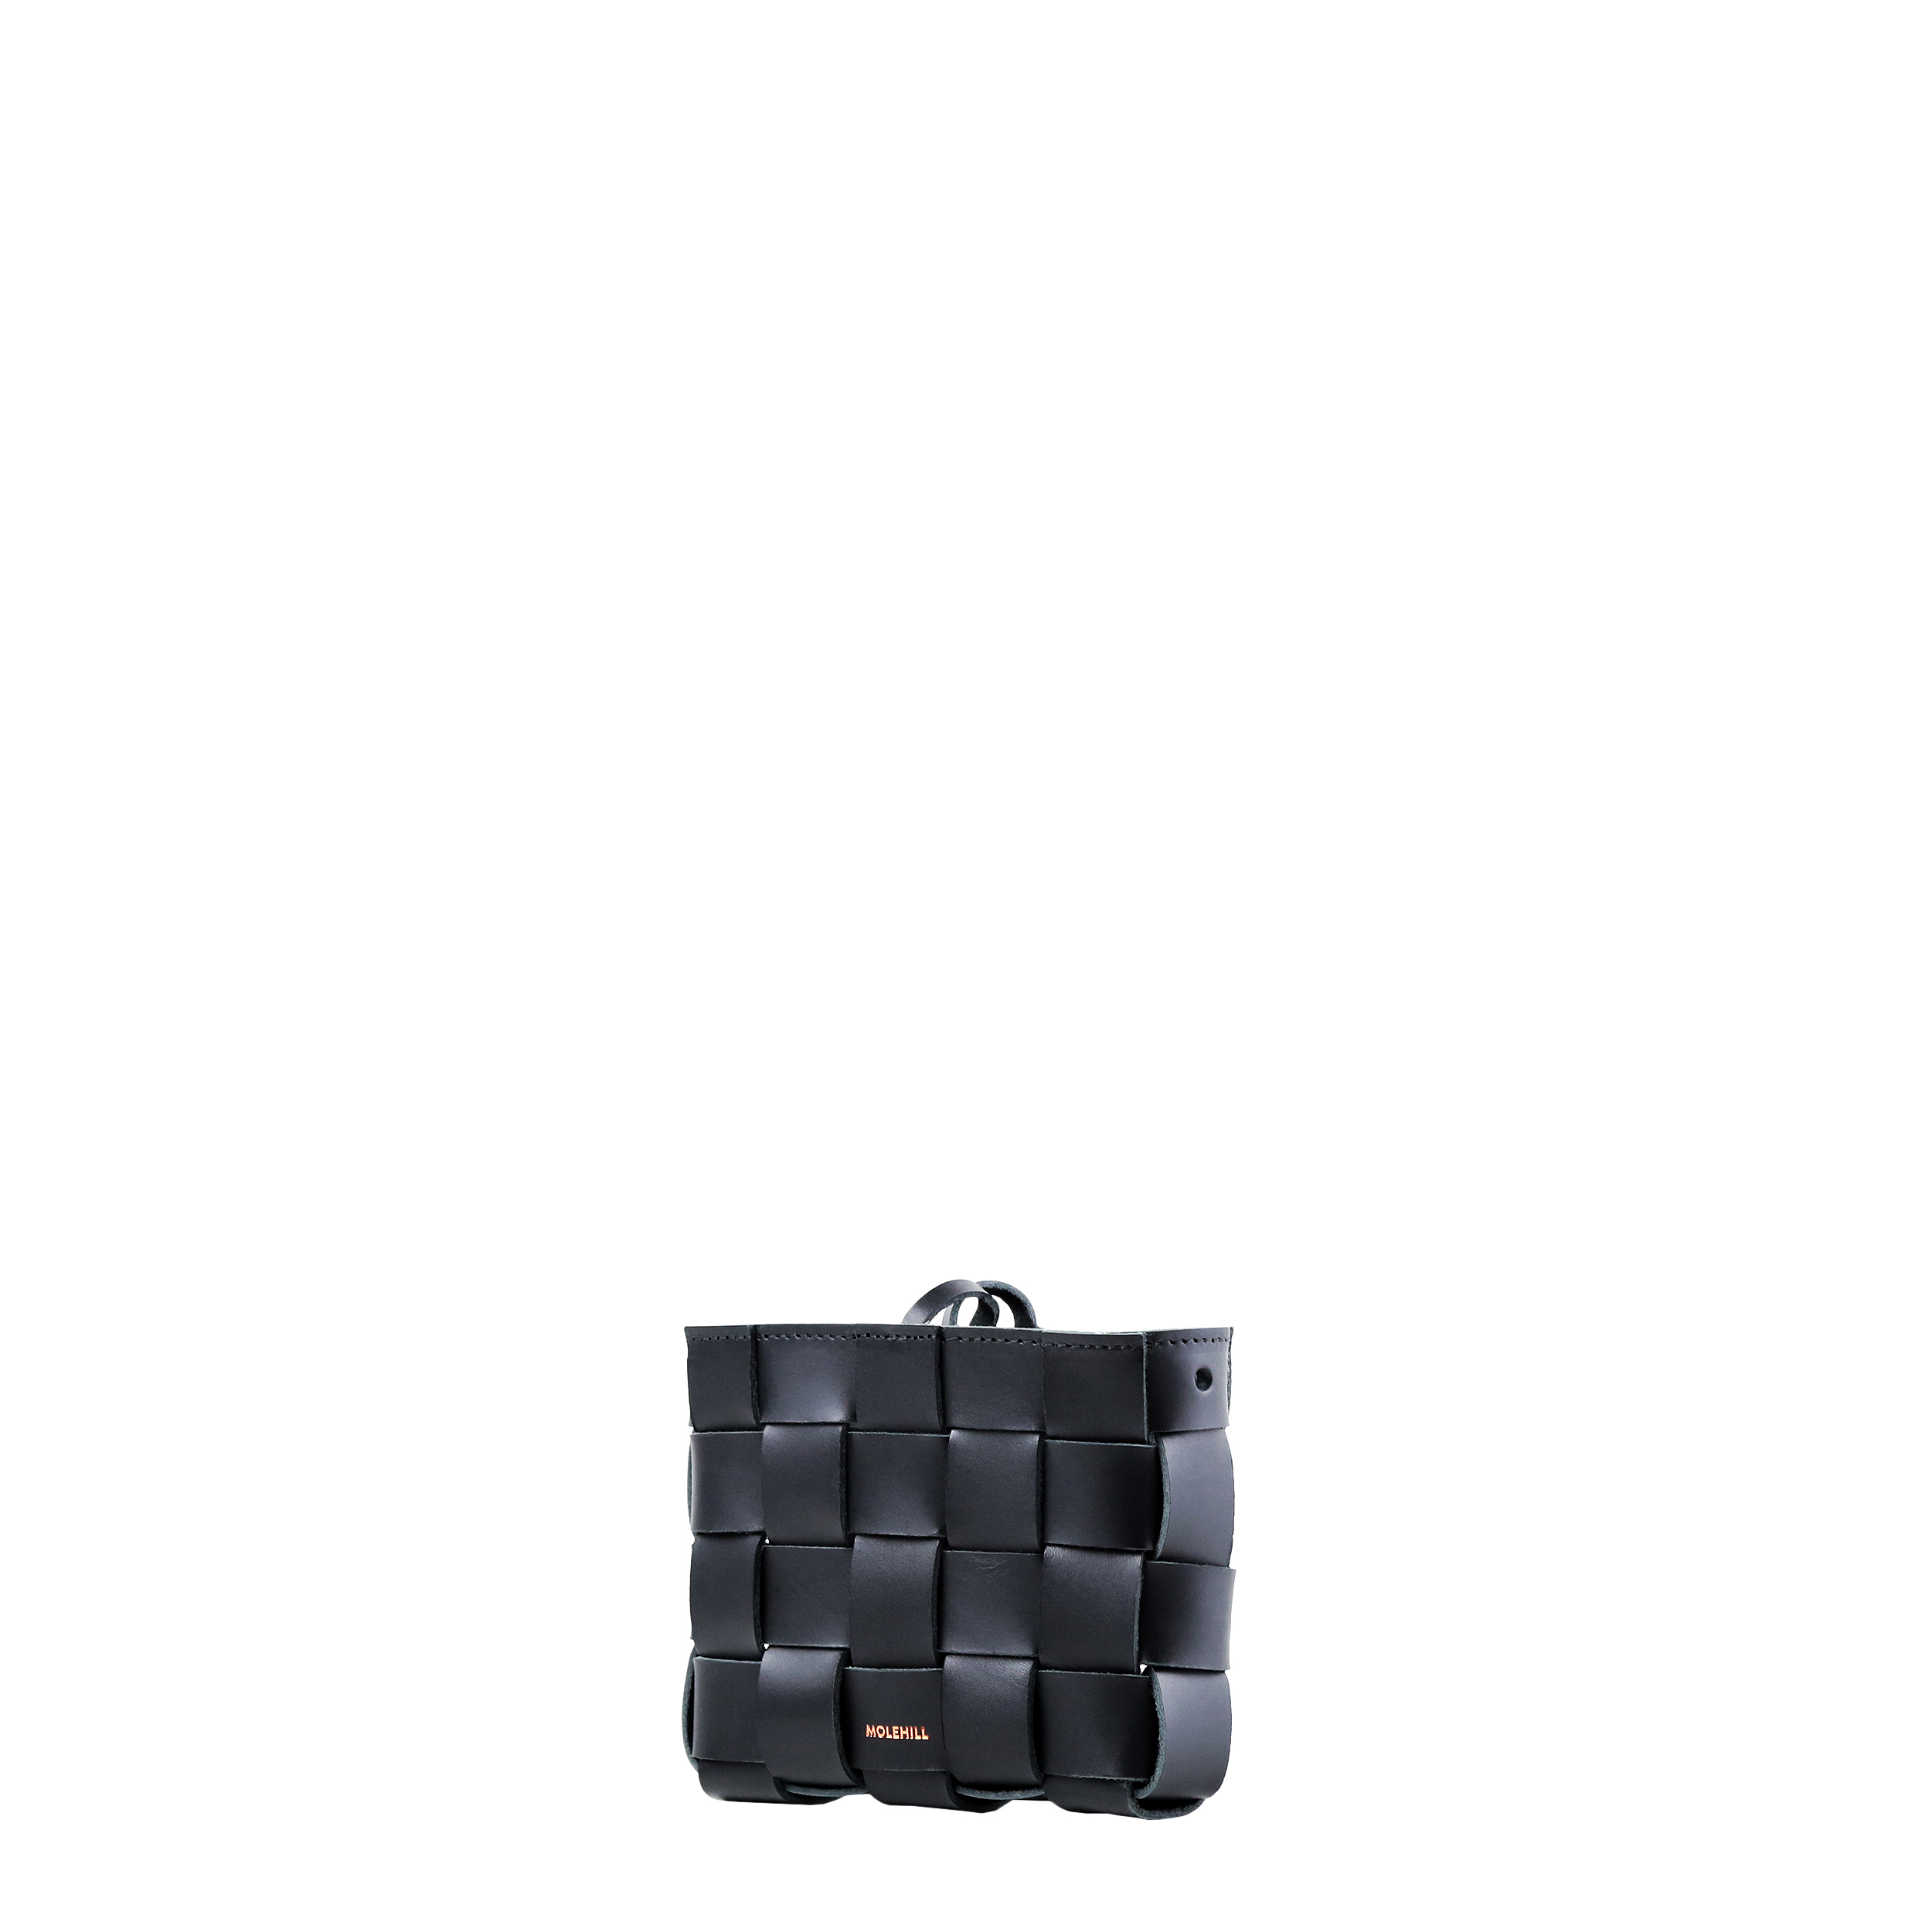 Pane Mini Crossbody Woven Bag Black-3